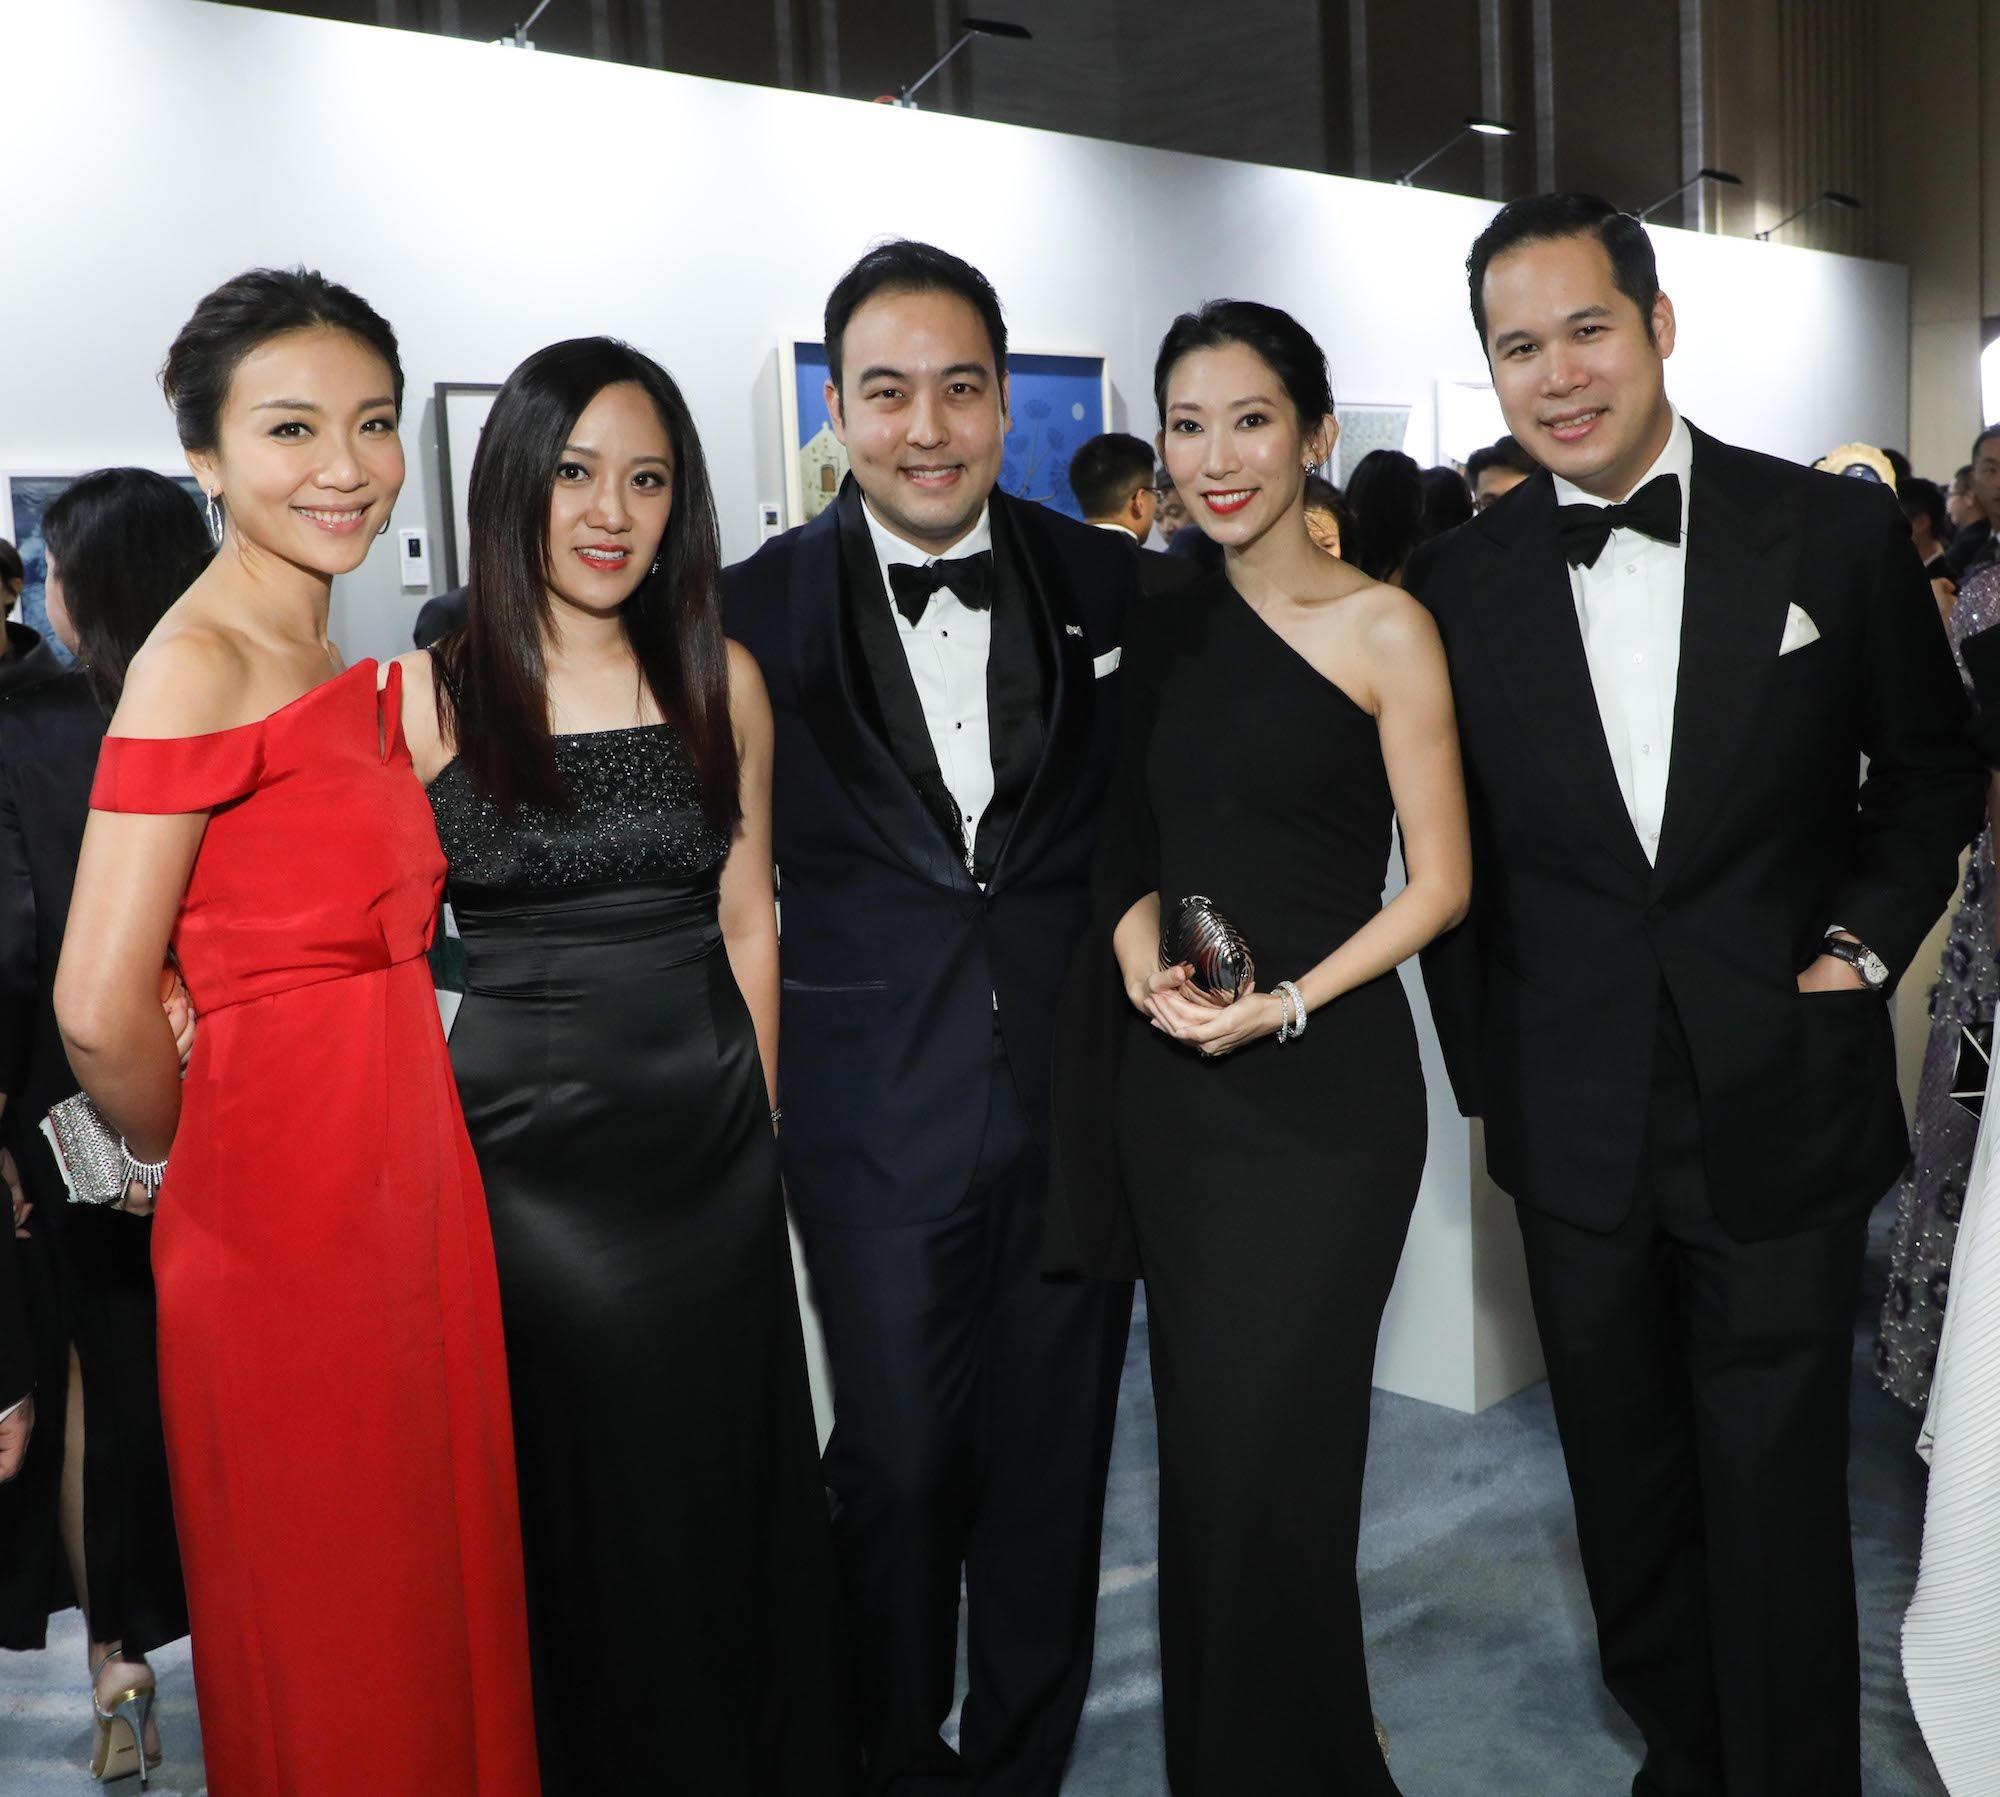 Jacqueline Sun, Jenny Chau, Leonard Chao, Candice Chan, Brandon Chau